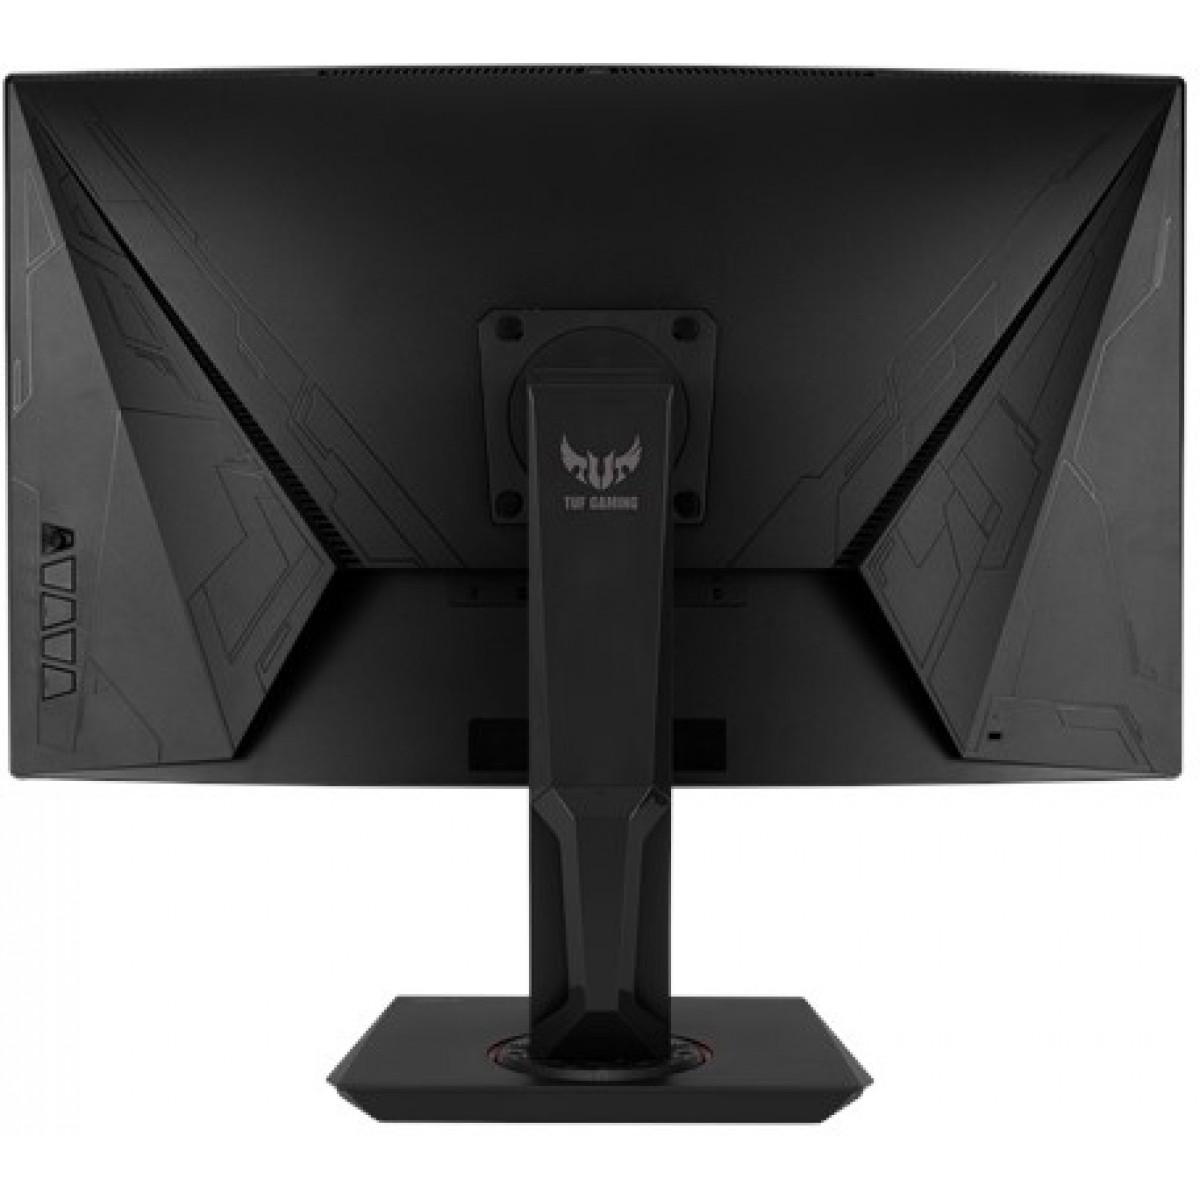 Monitor Gamer Asus TUF Gaming LCD 31,5 Pol, Widescreen Curvo, 144Hz, 1ms, HDMI, DisplayPort, Som integrado, VG32VQ